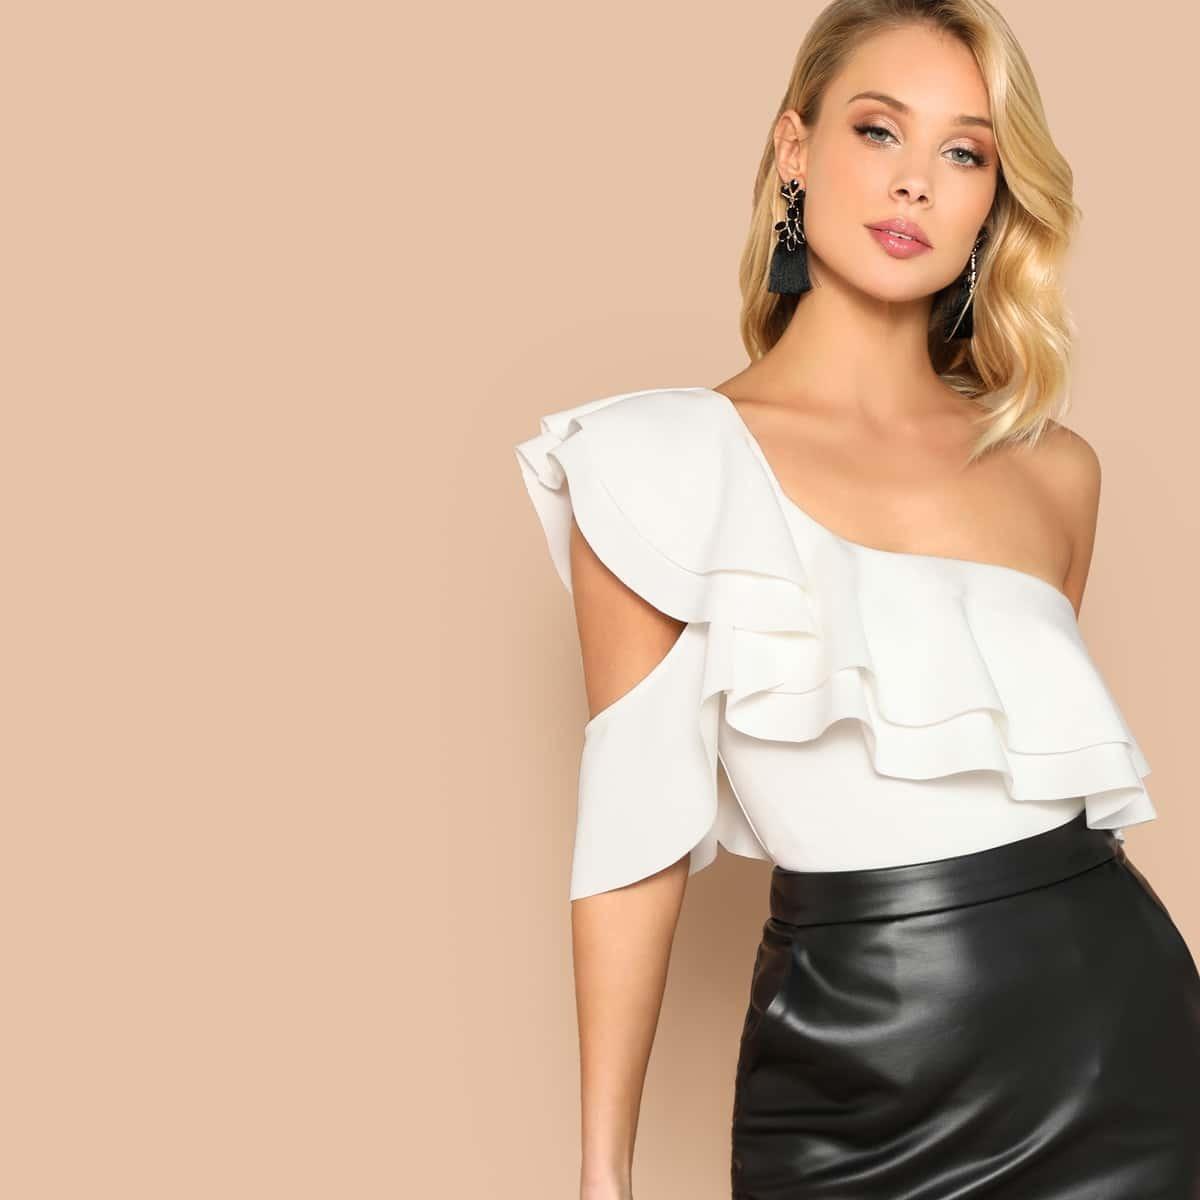 SHEIN coupon: Layered Ruffle One Shoulder Bodysuit